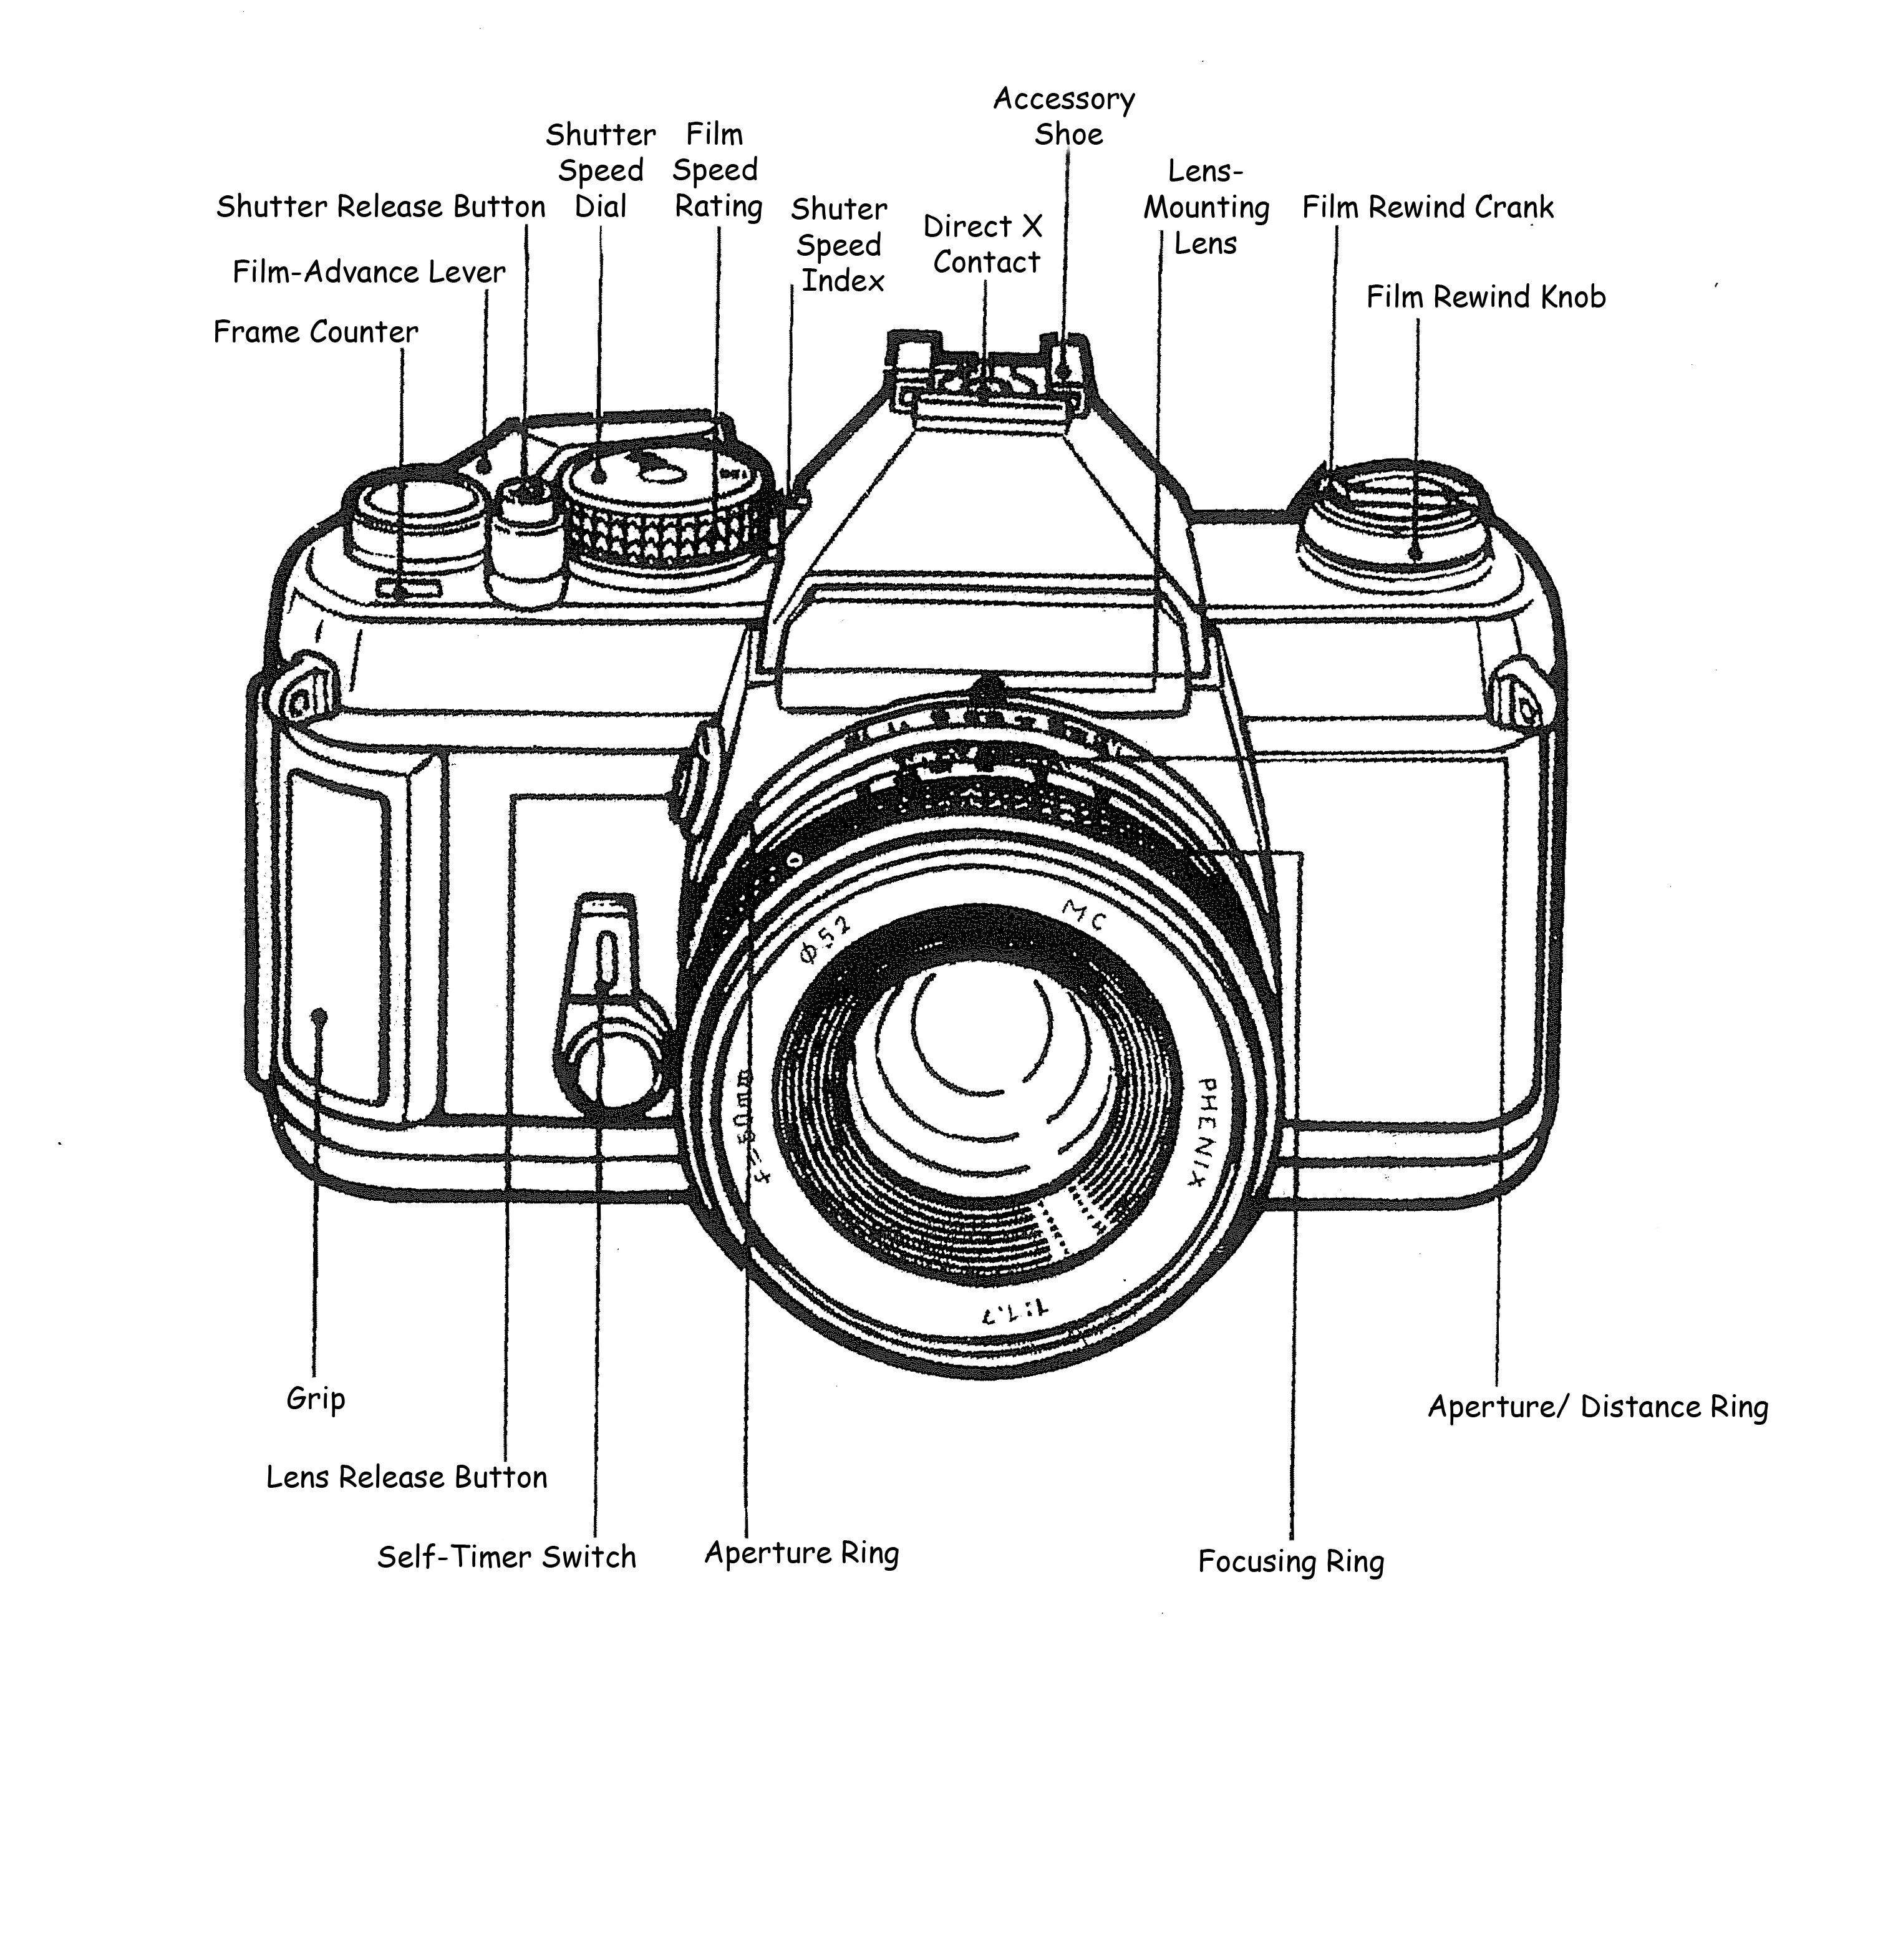 perins school photography moodle [ 3027 x 3142 Pixel ]